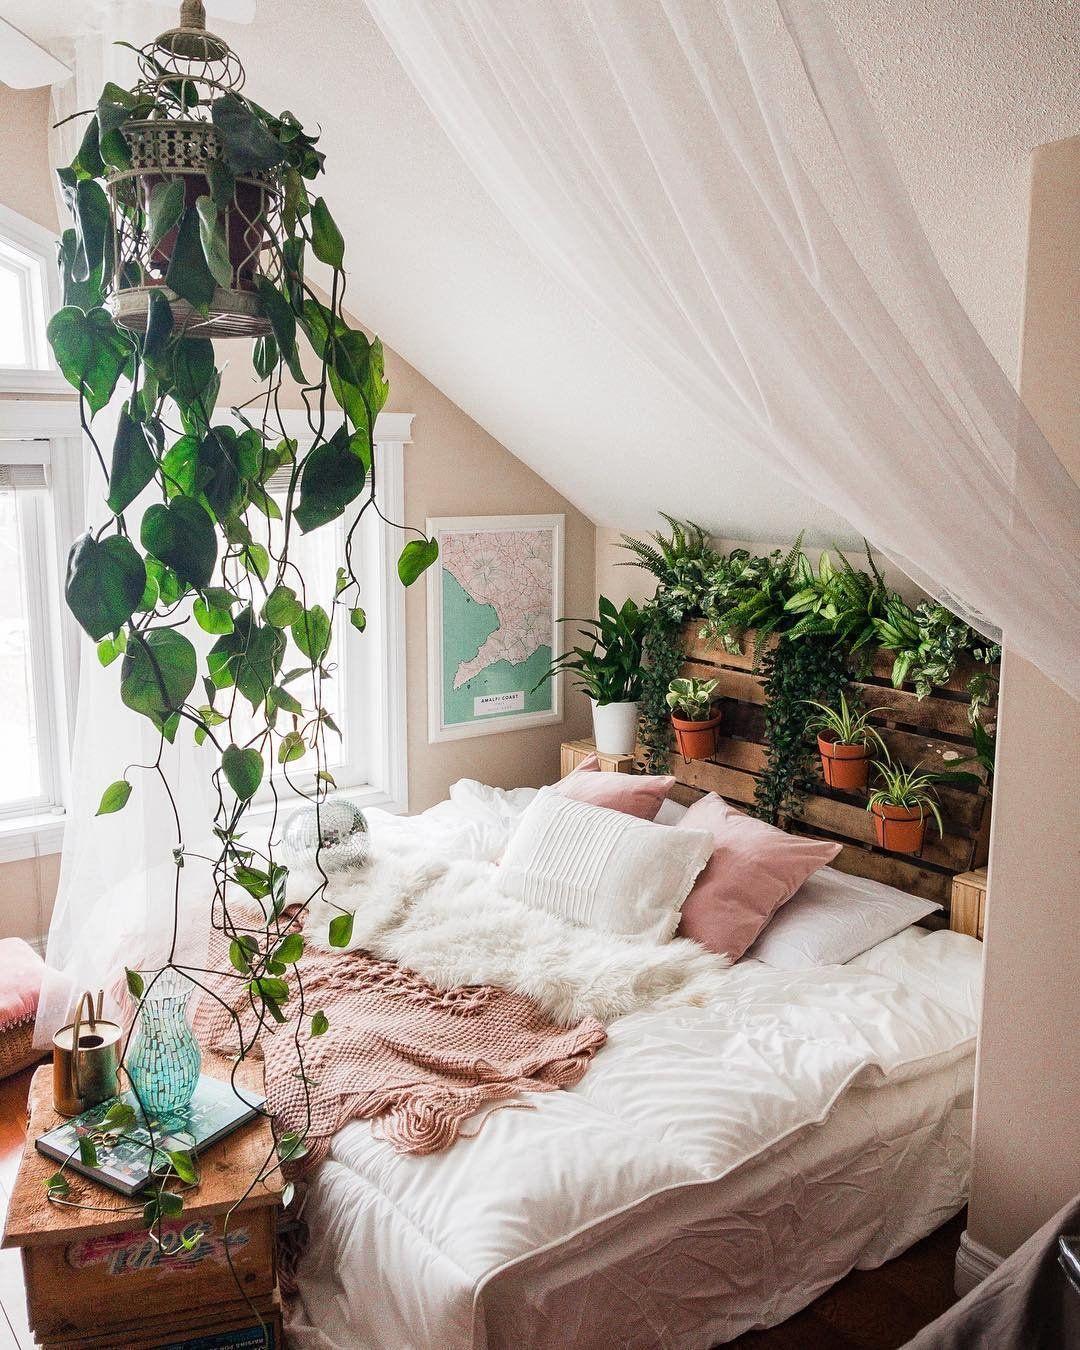 Pin by Jillian Carley on Boho/Artsy bedroom | Bedroom ...